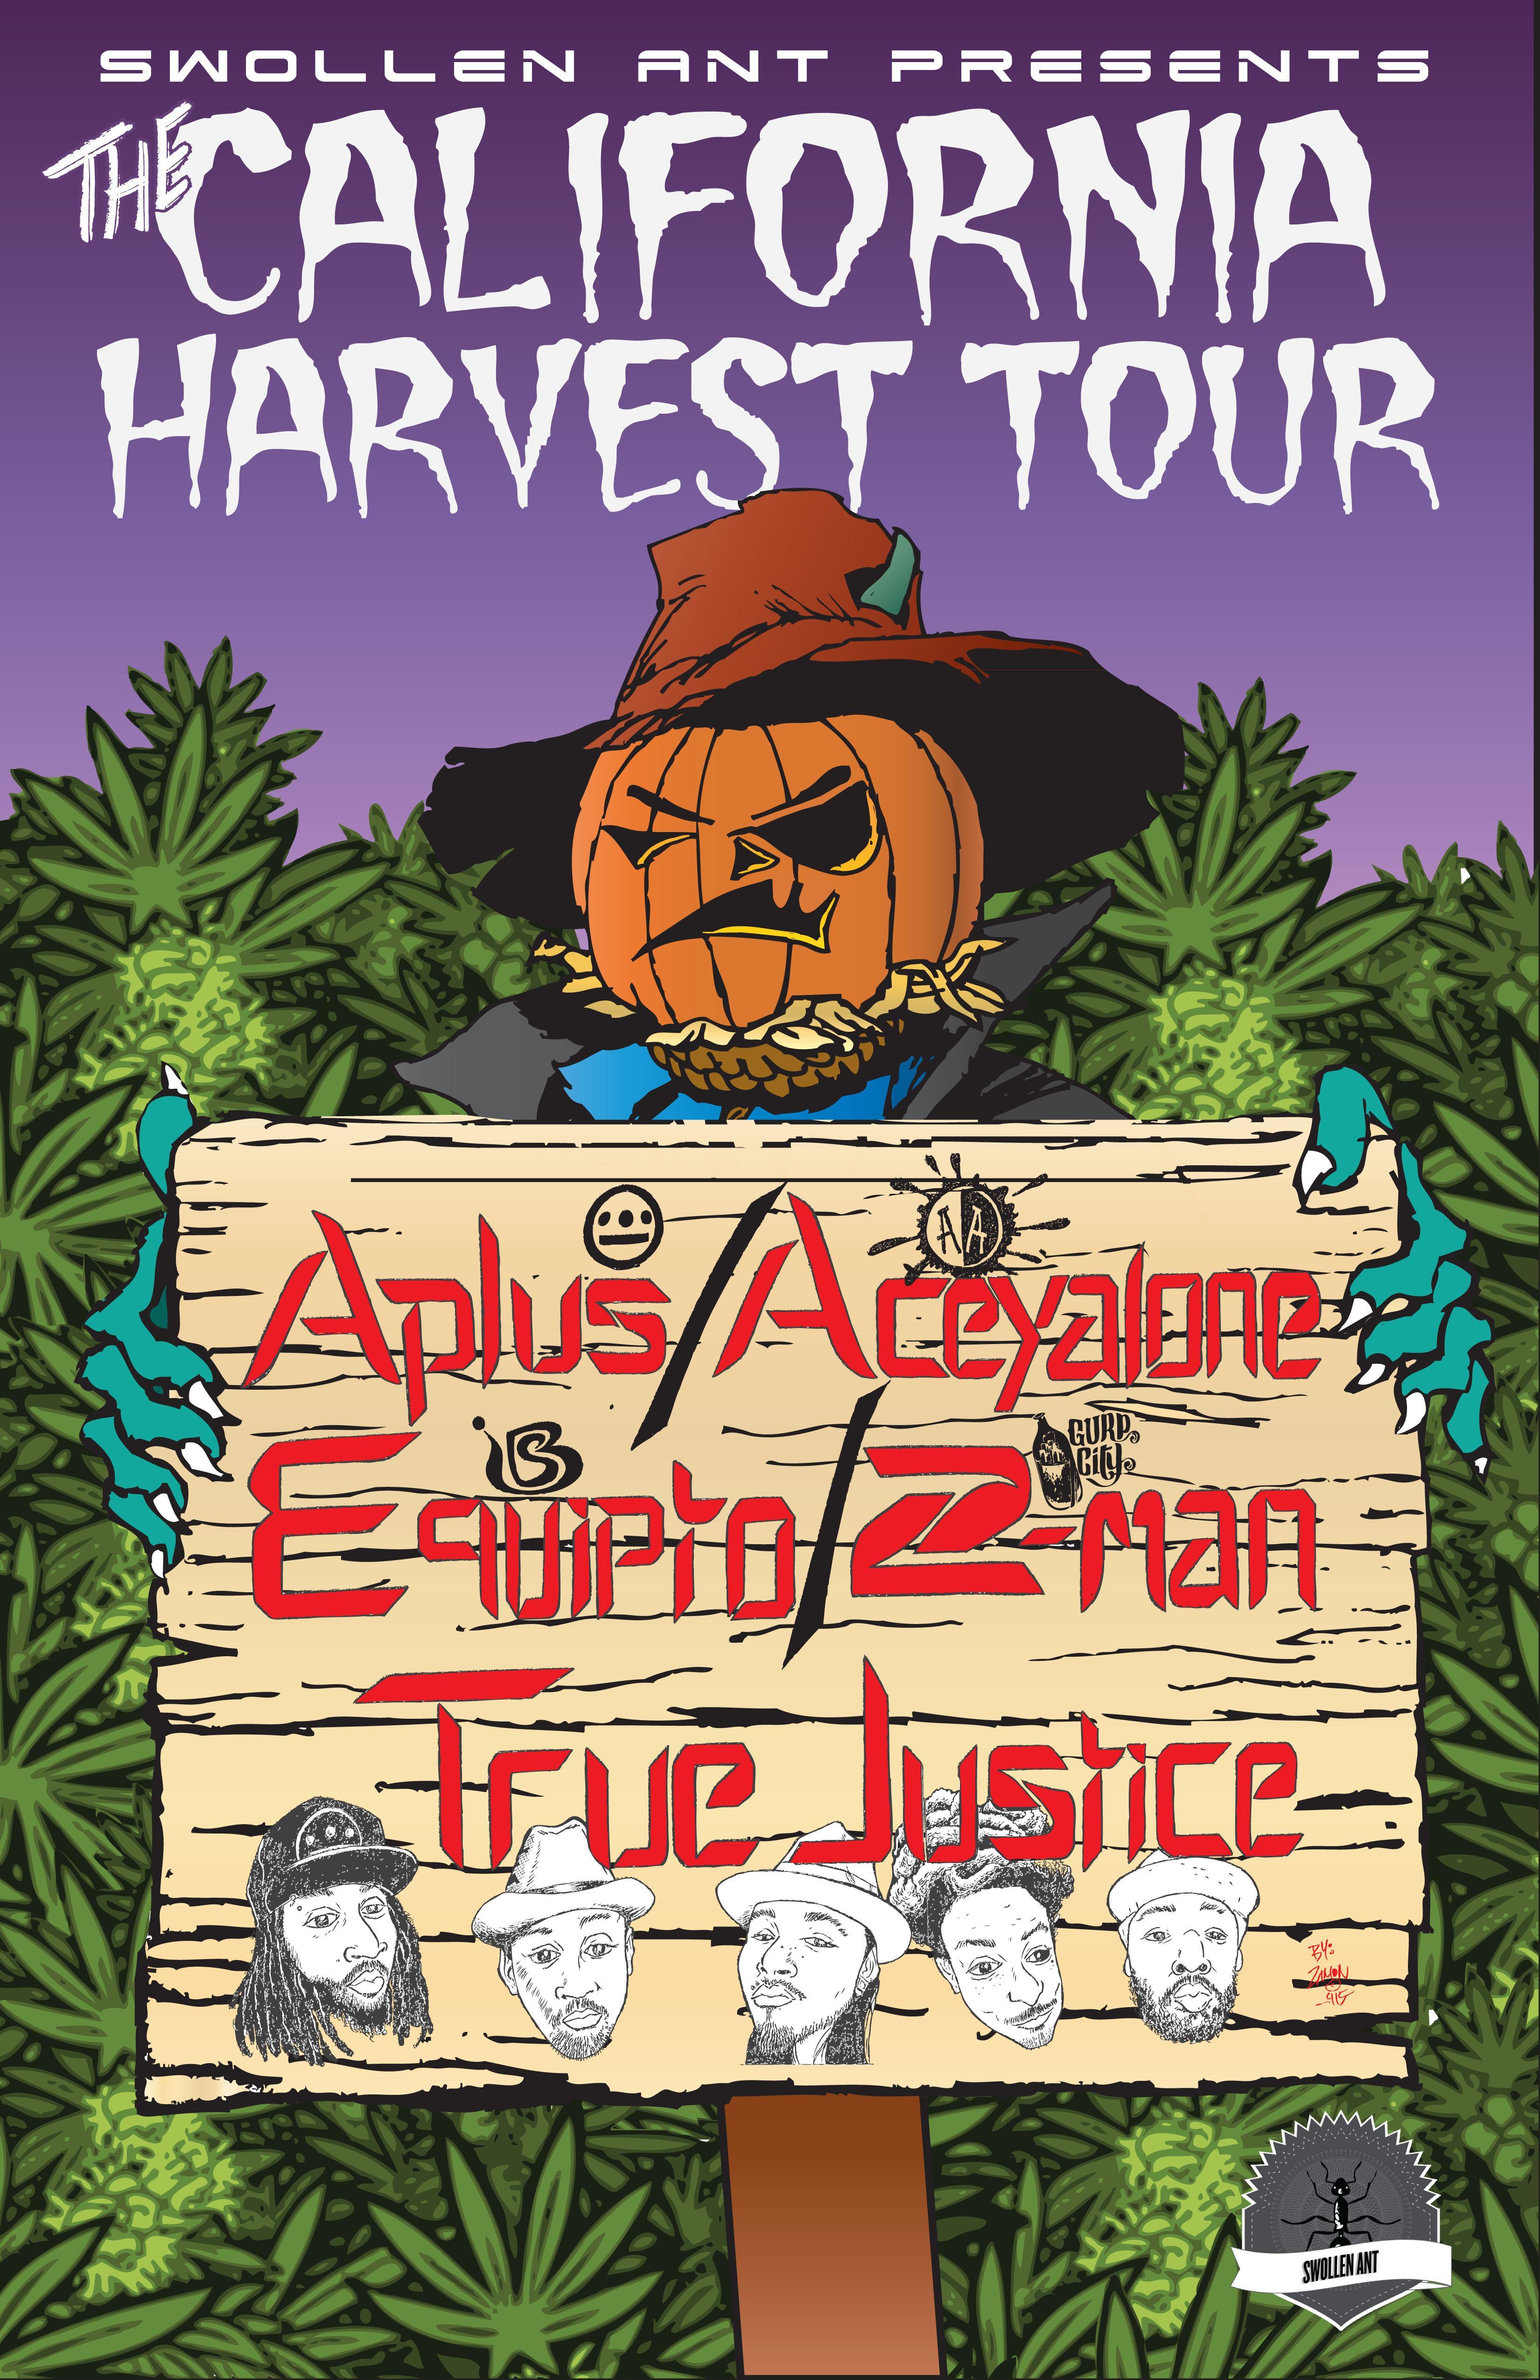 The California Harvest Tour